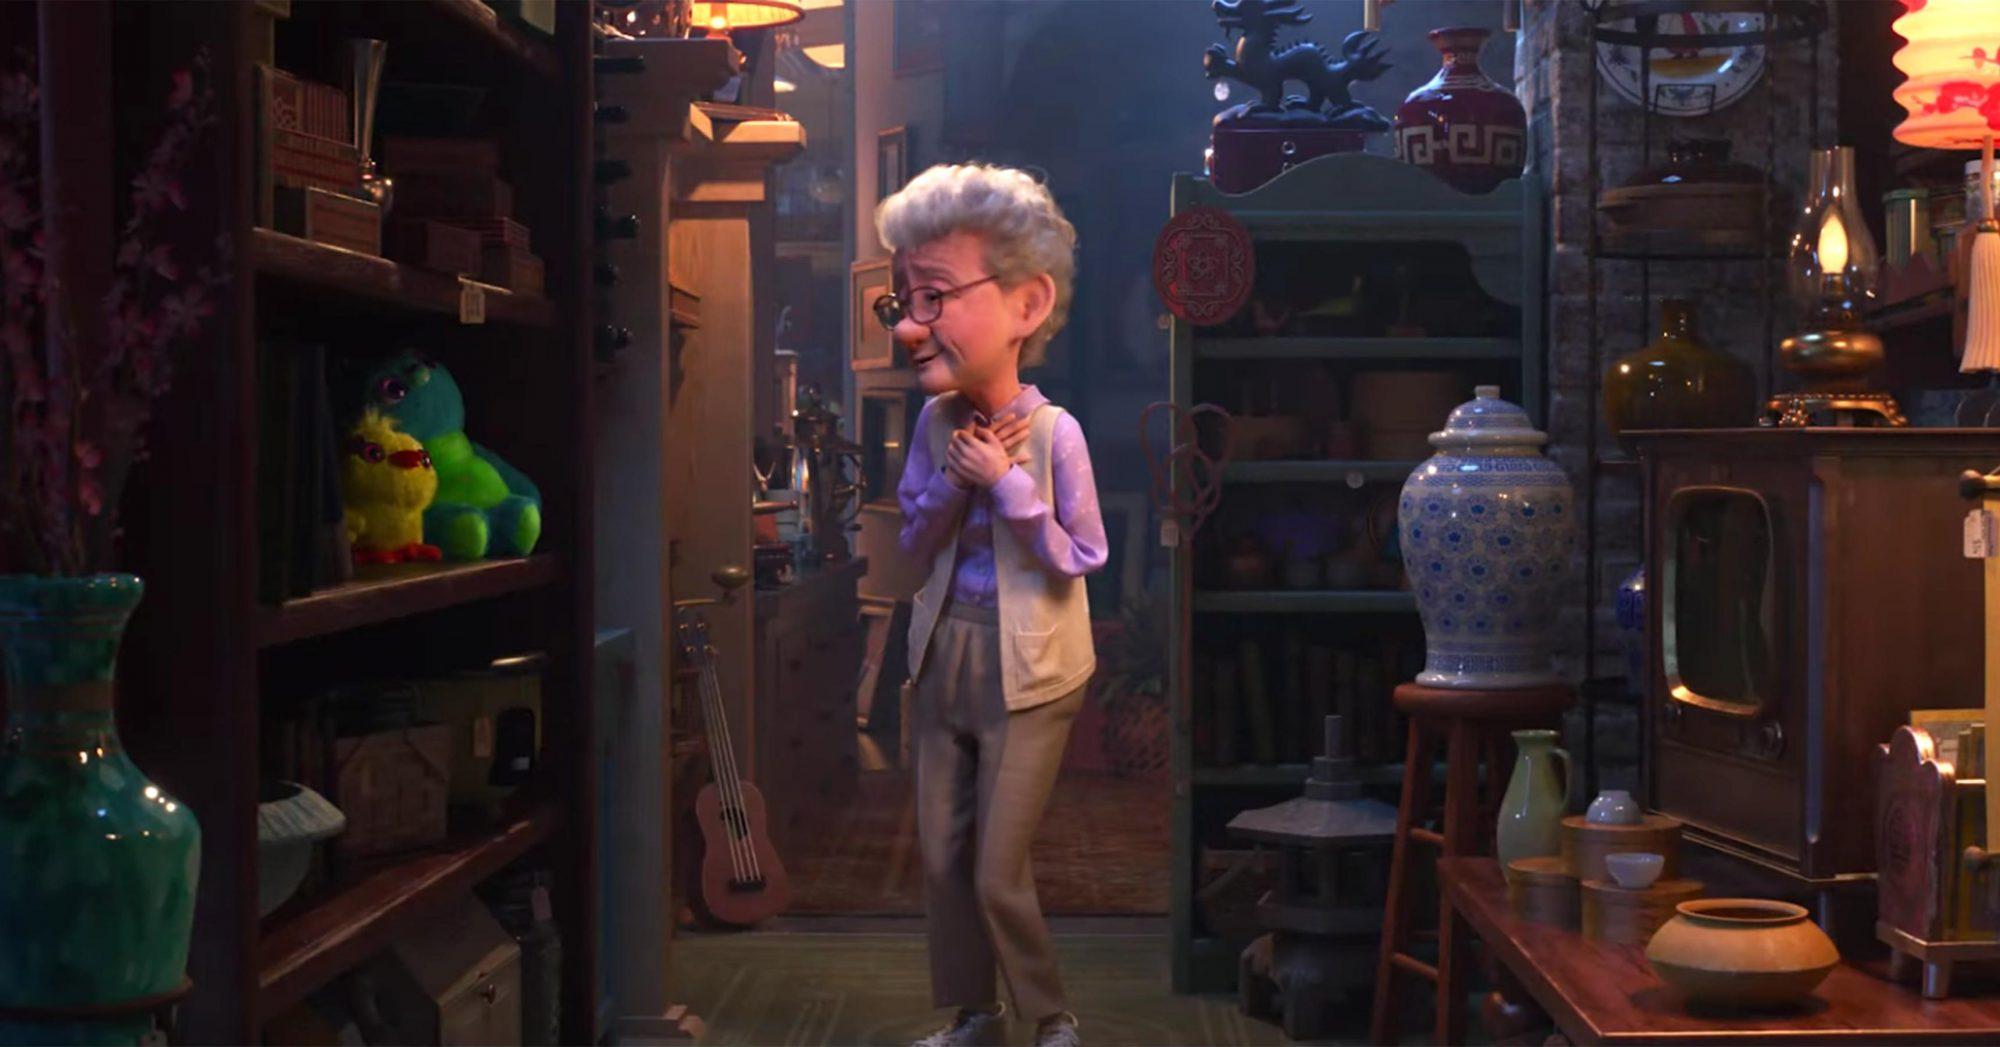 Toy Story 4 | Now Playing (screen grab) https://www.youtube.com/watch?v=hUrfRXnINxU CR: Disney/Pixar